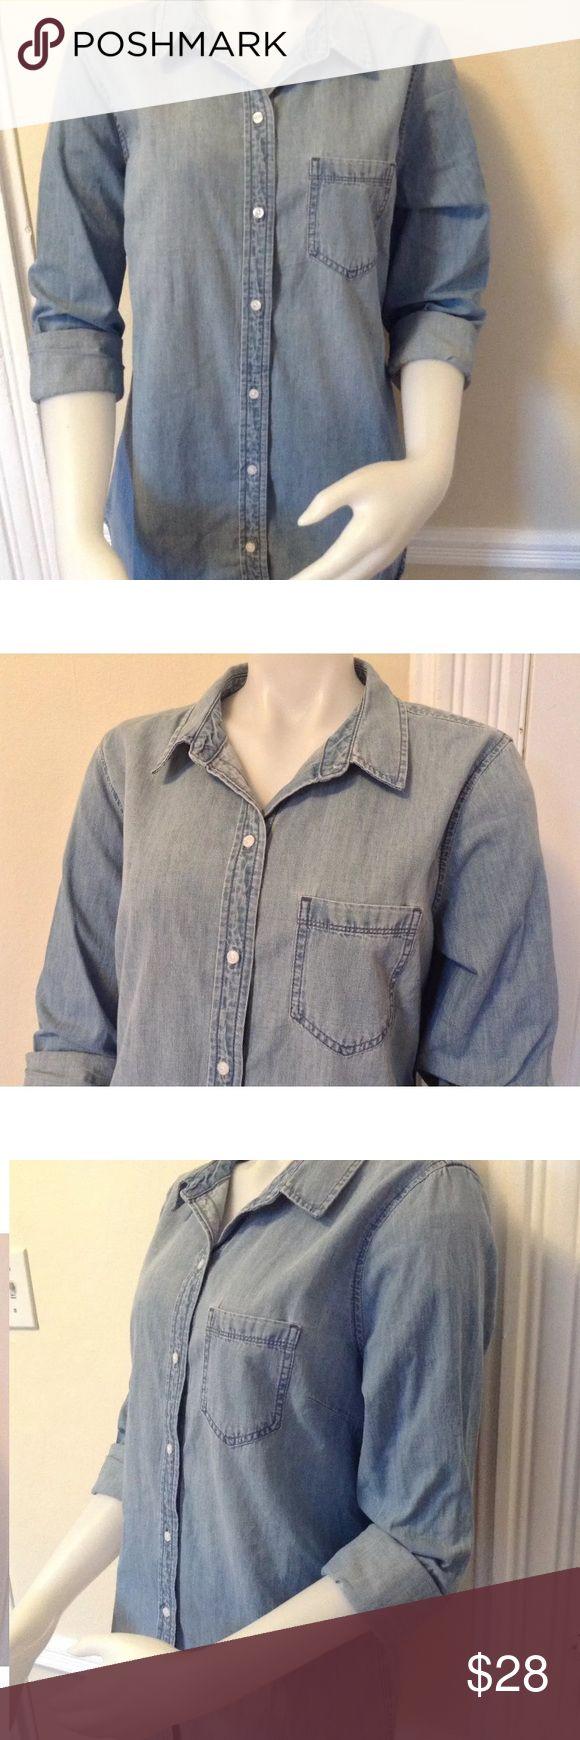 NWT Gap women's denim shirt  Large size Blue indigo GAP Tops Button Down Shirts